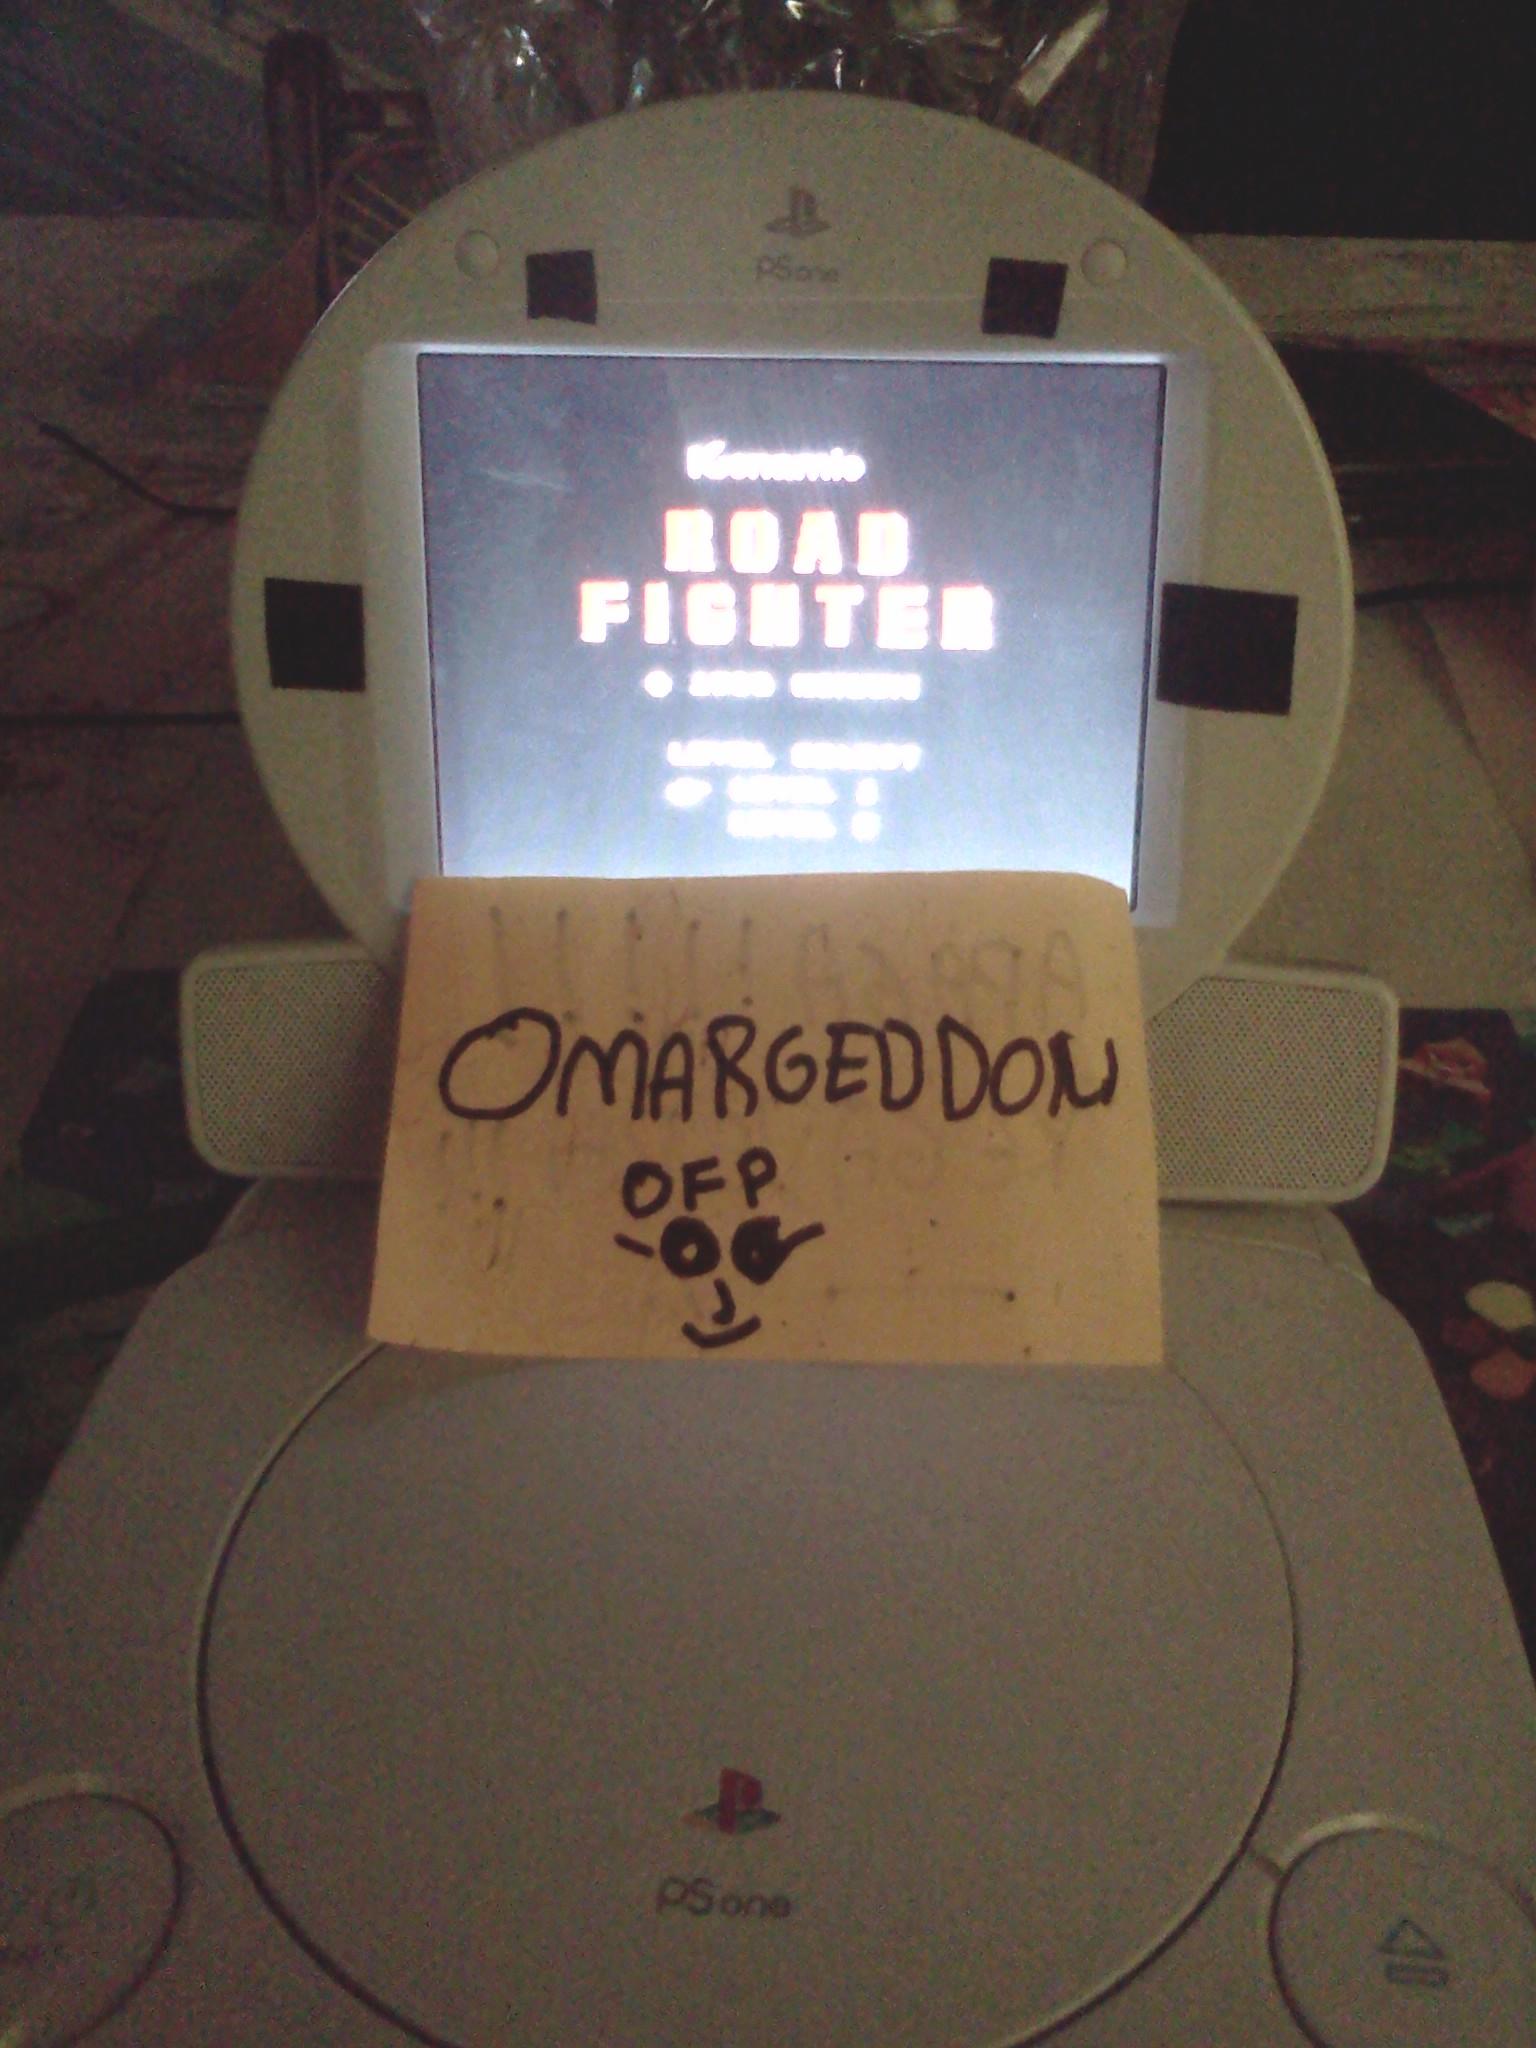 omargeddon: Galaga (Jakks Pacific Retro Arcade Pac-Man) 62,380 points on 2016-07-25 18:58:43